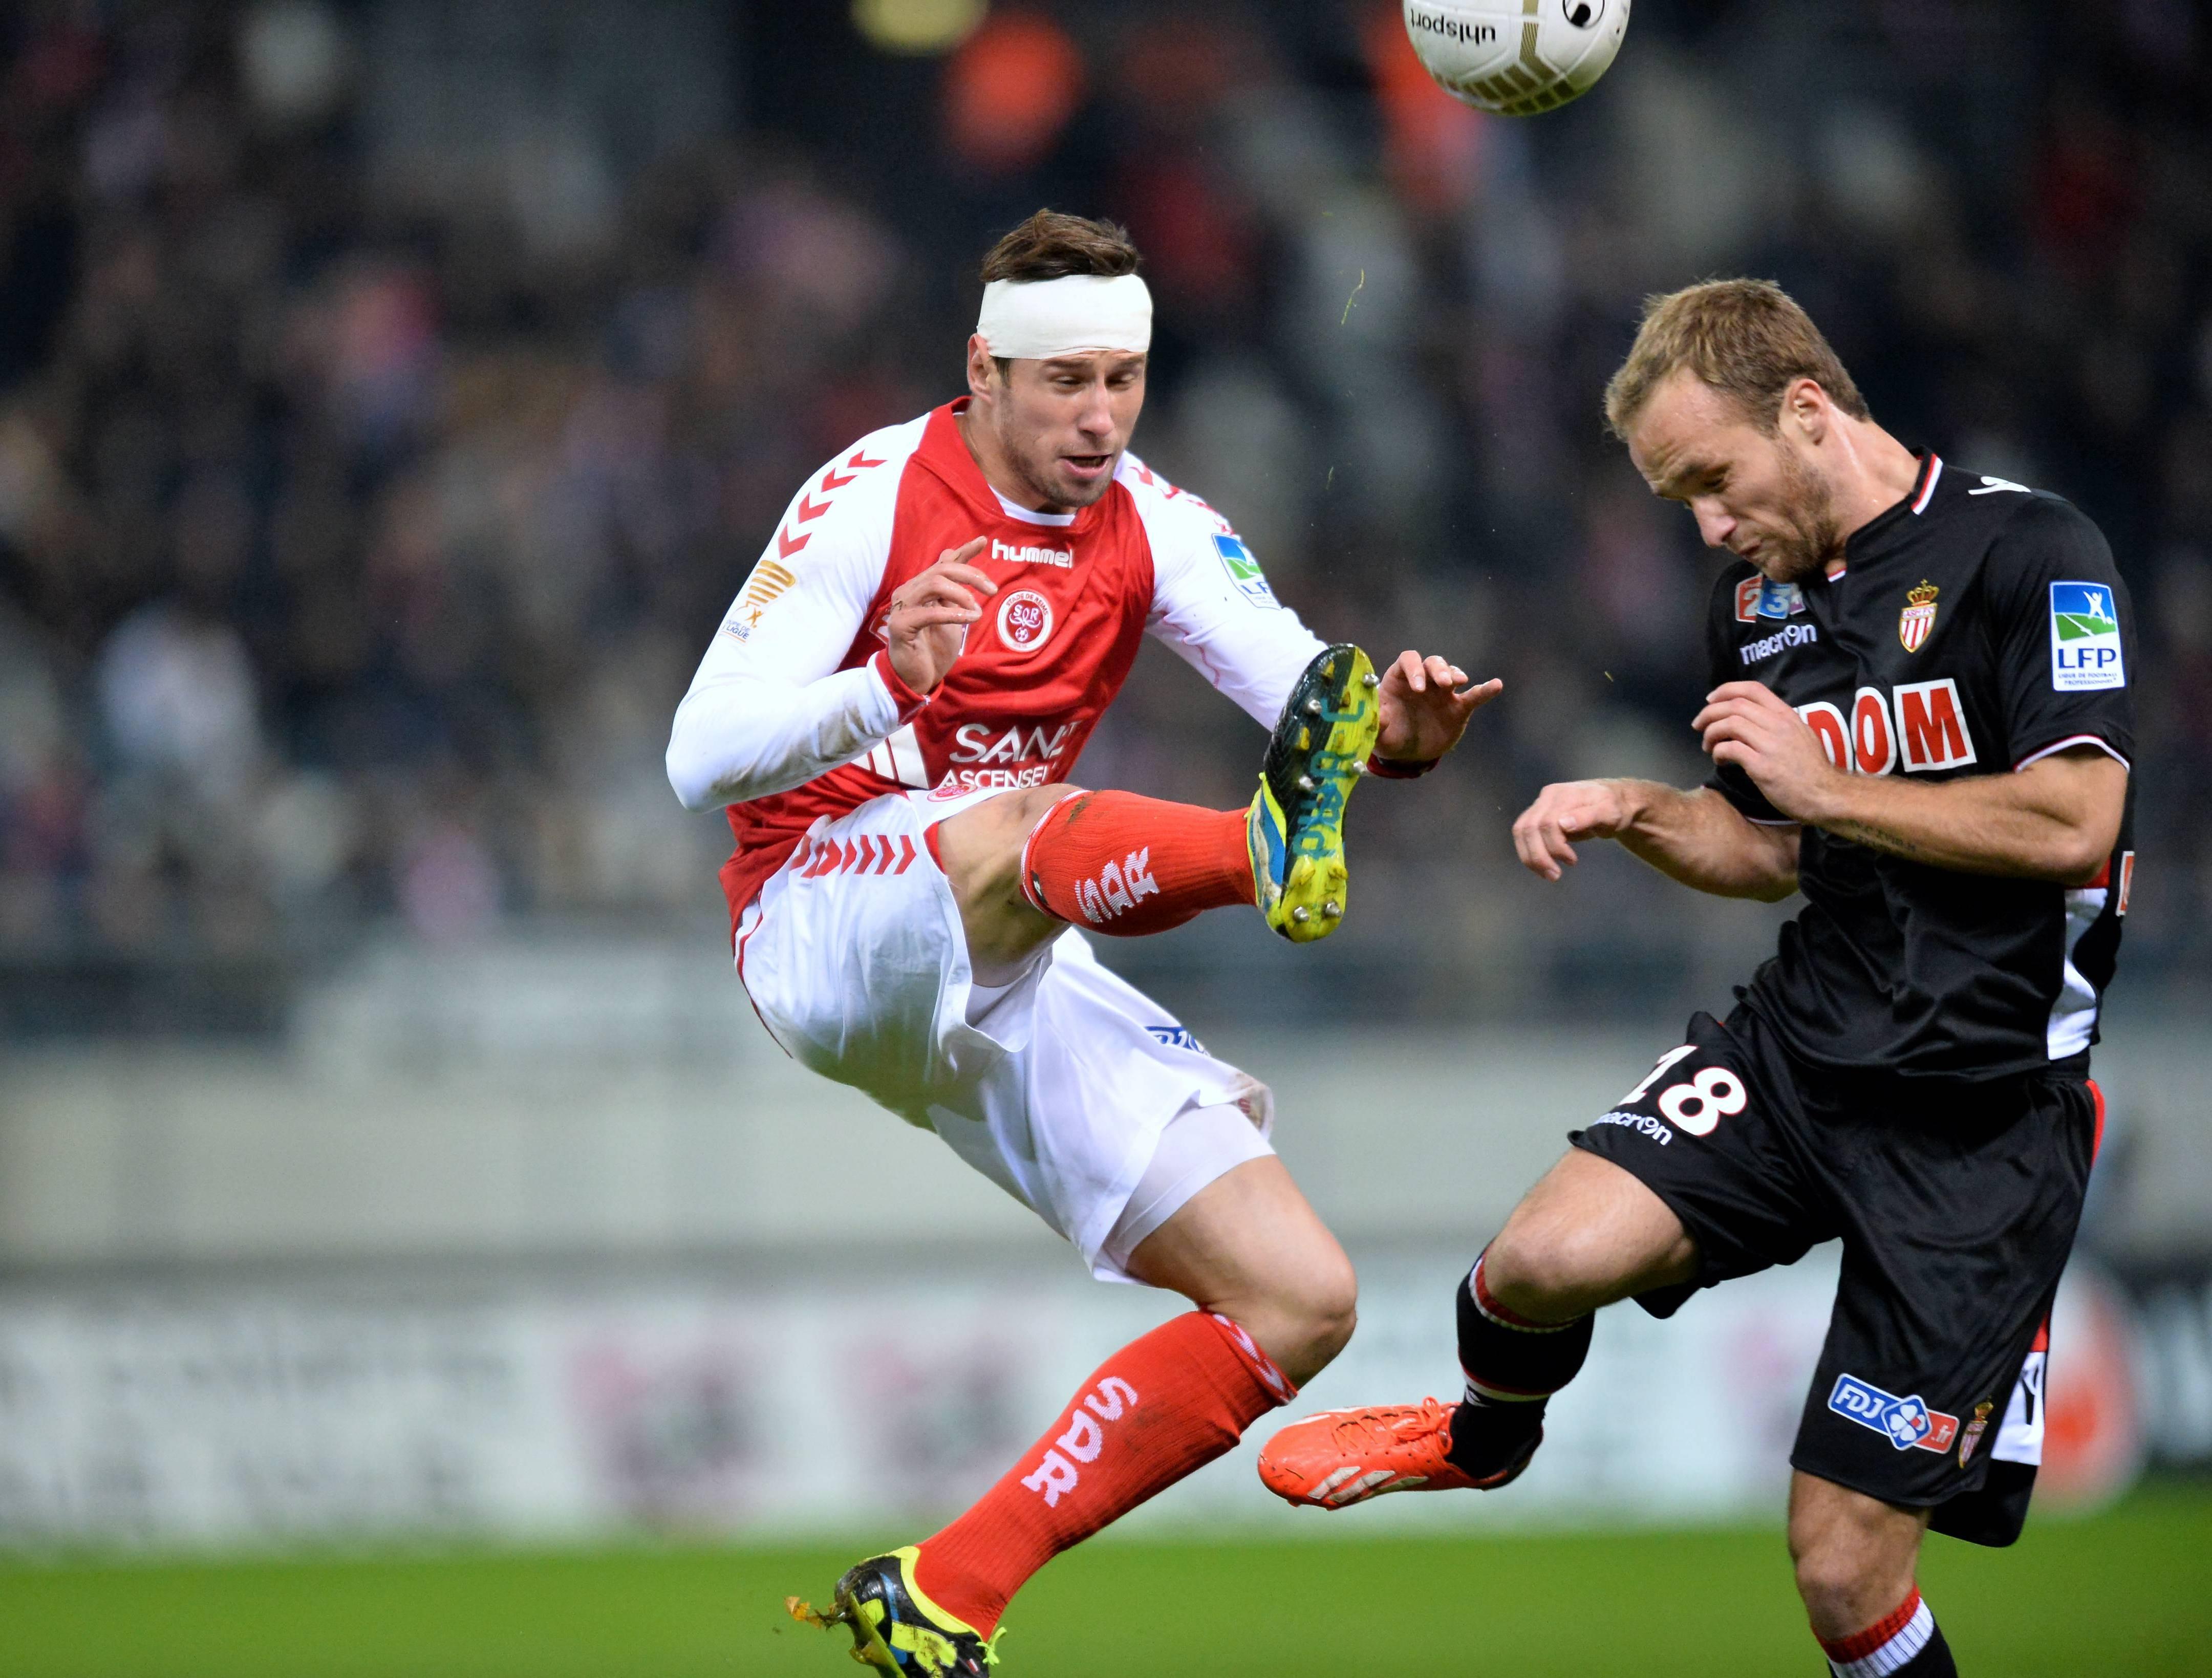 Krychowiak à Anderlecht dans un deal lucratif pour les Girondins ?